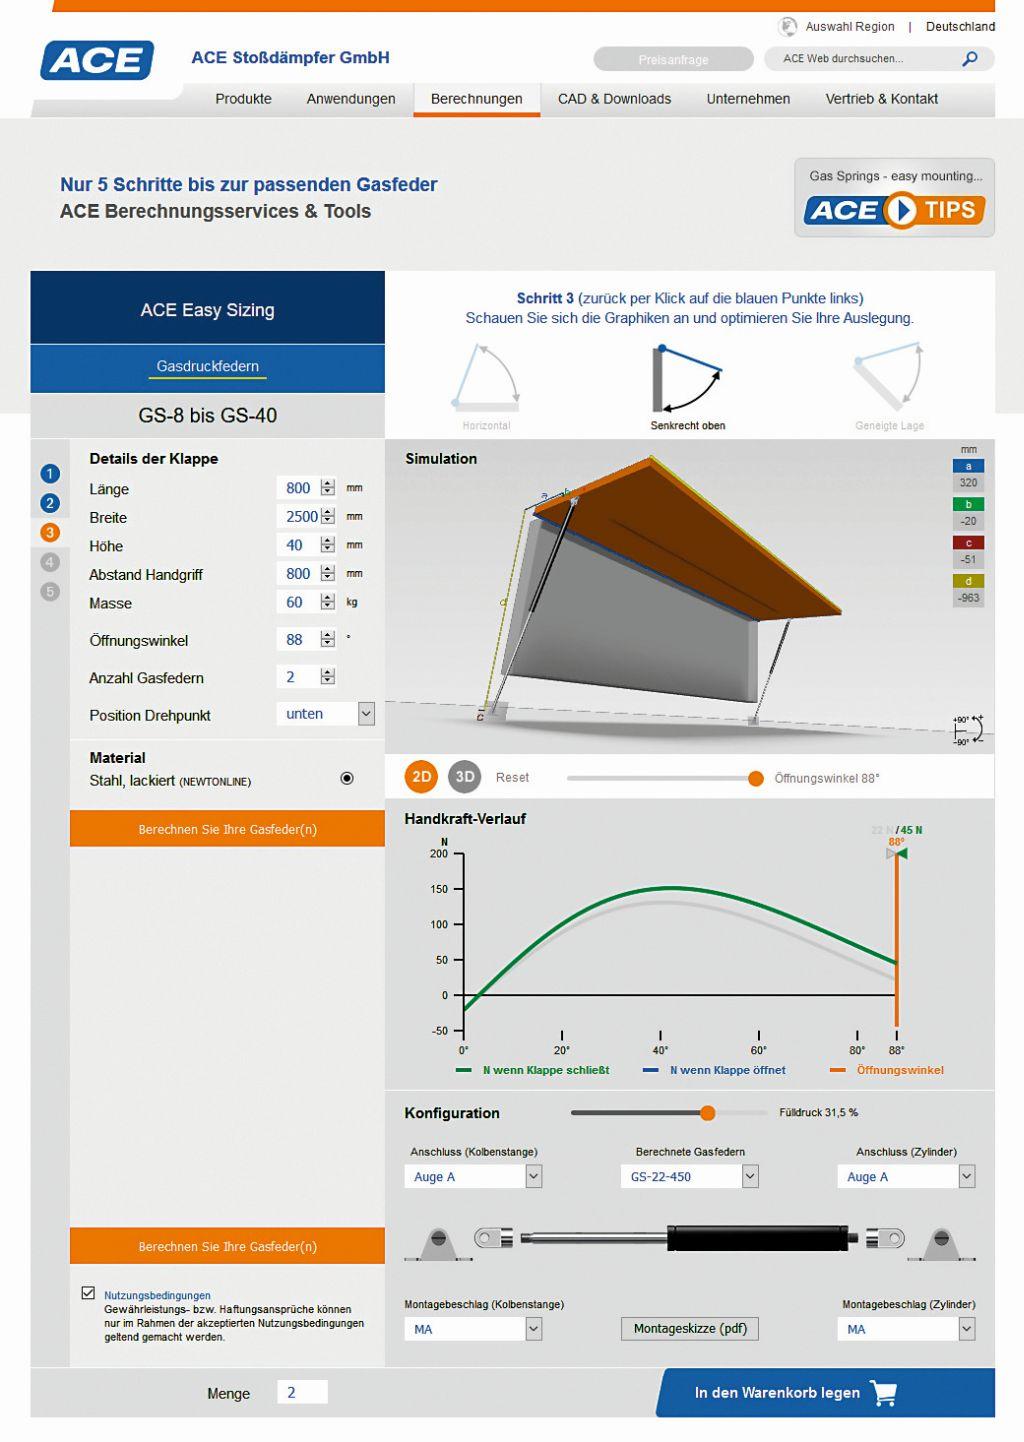 ace industriegasfedern effektive helfer beim bandagieren. Black Bedroom Furniture Sets. Home Design Ideas